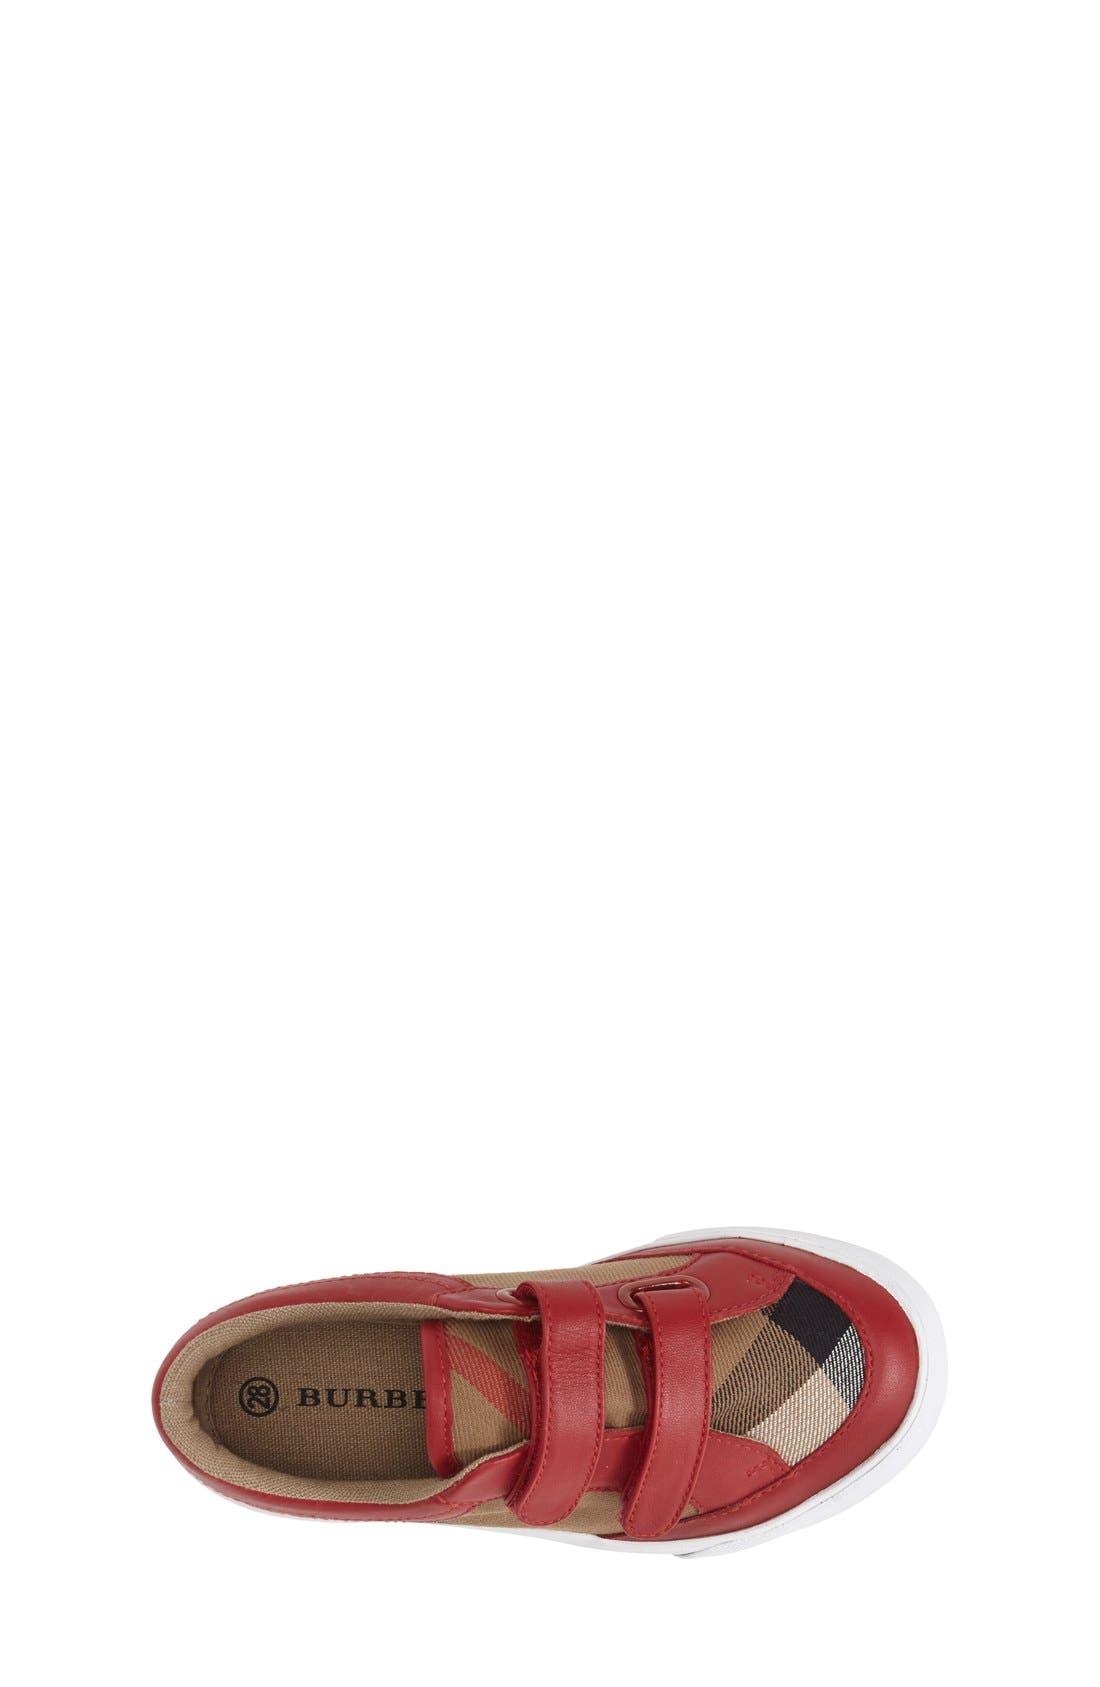 Mini Heacham Sneaker,                             Alternate thumbnail 3, color,                             Parade Red